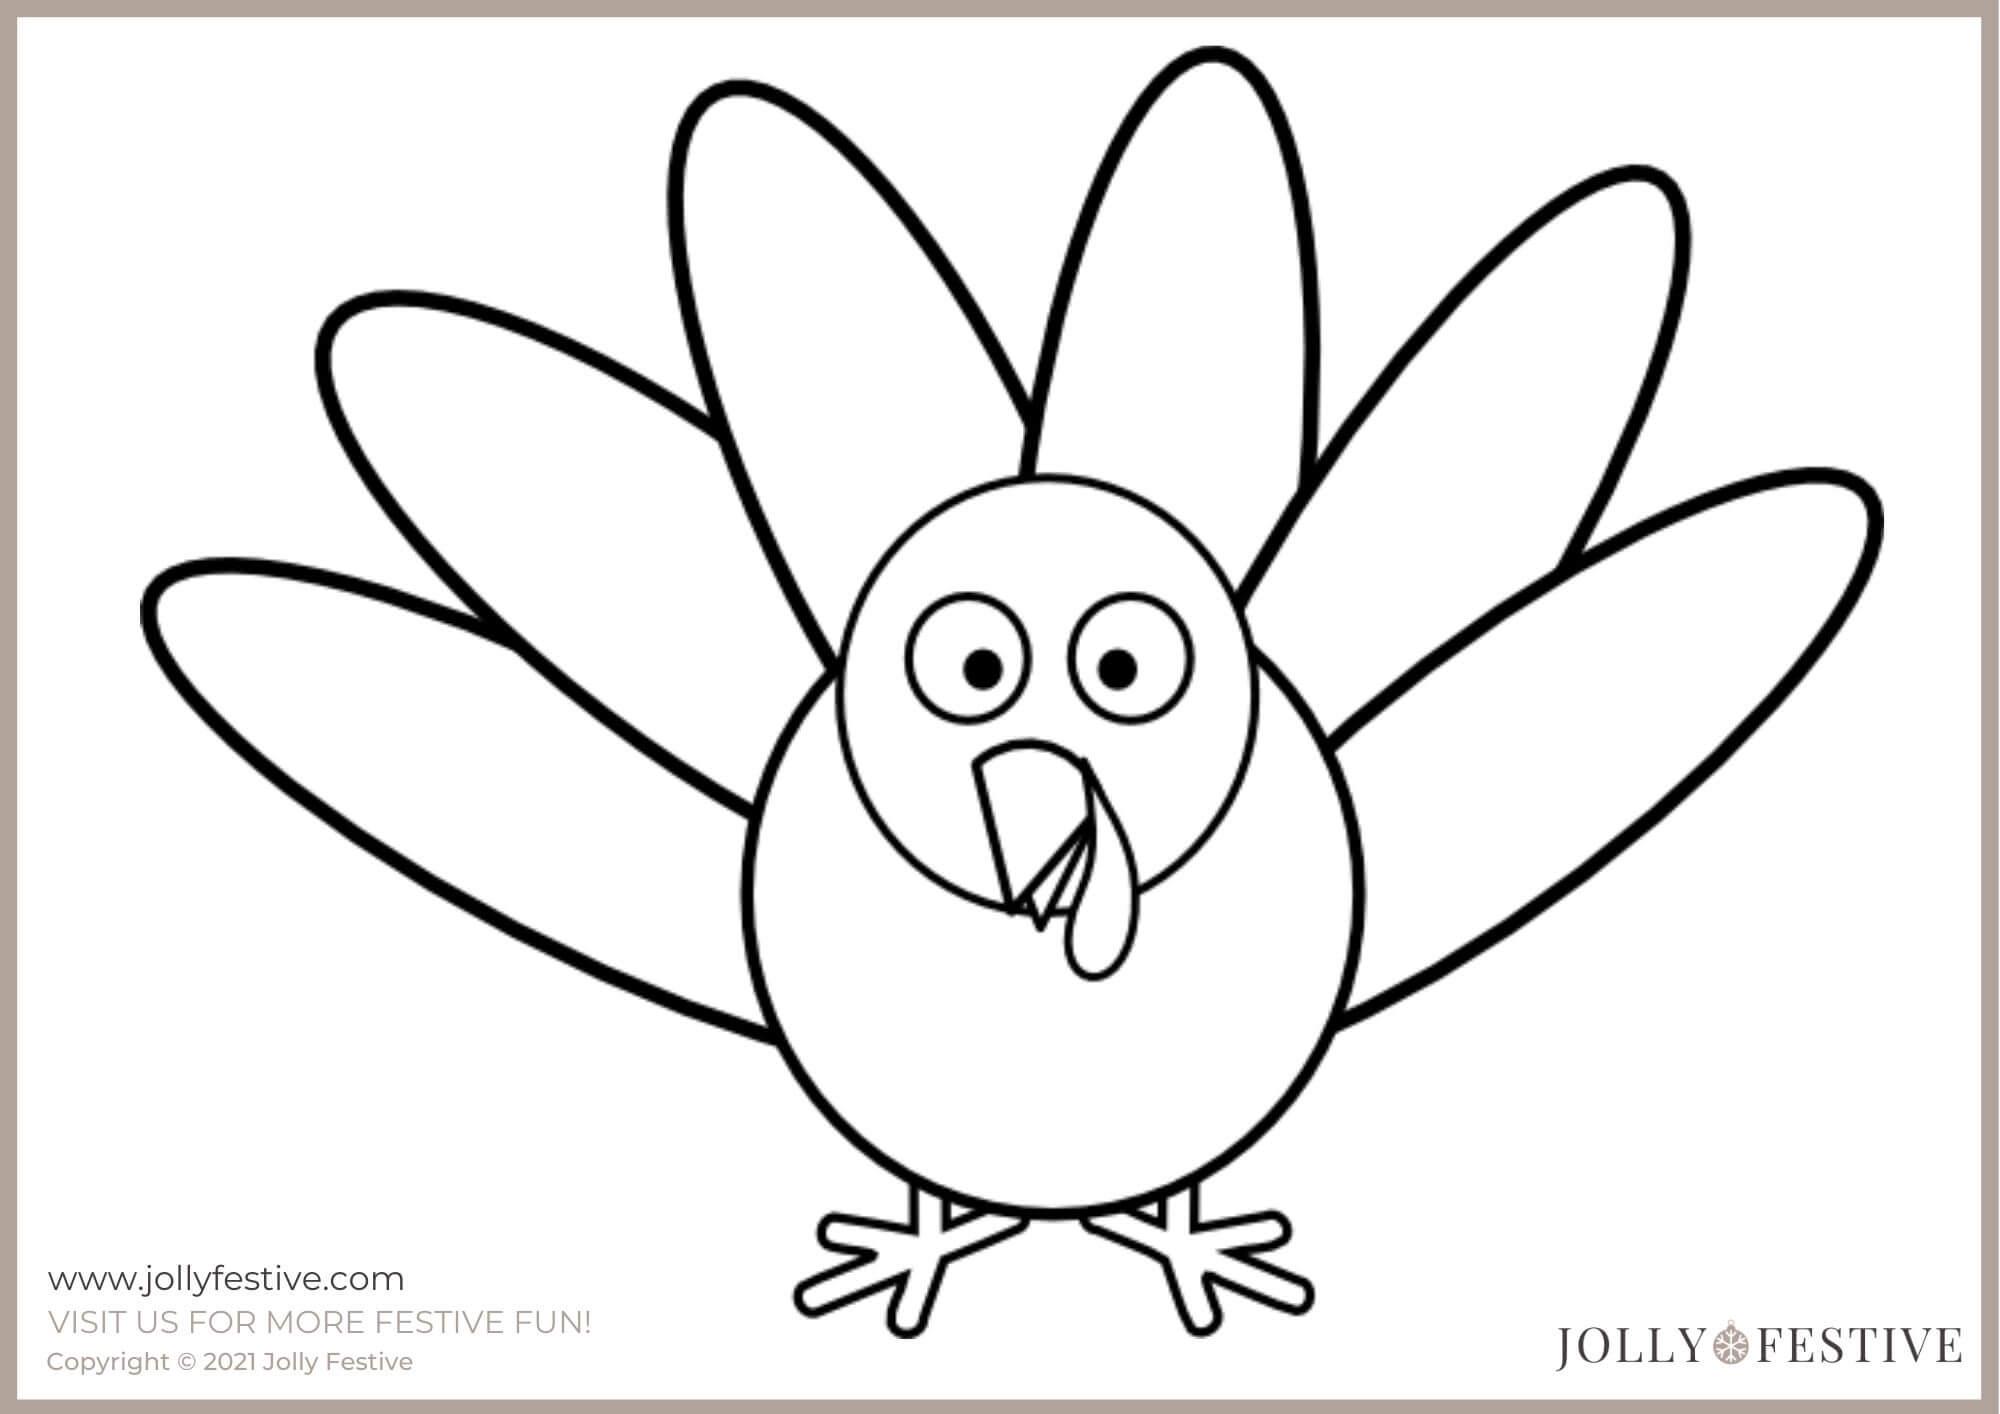 Jolly Festive Turkey Outline A4 Printable